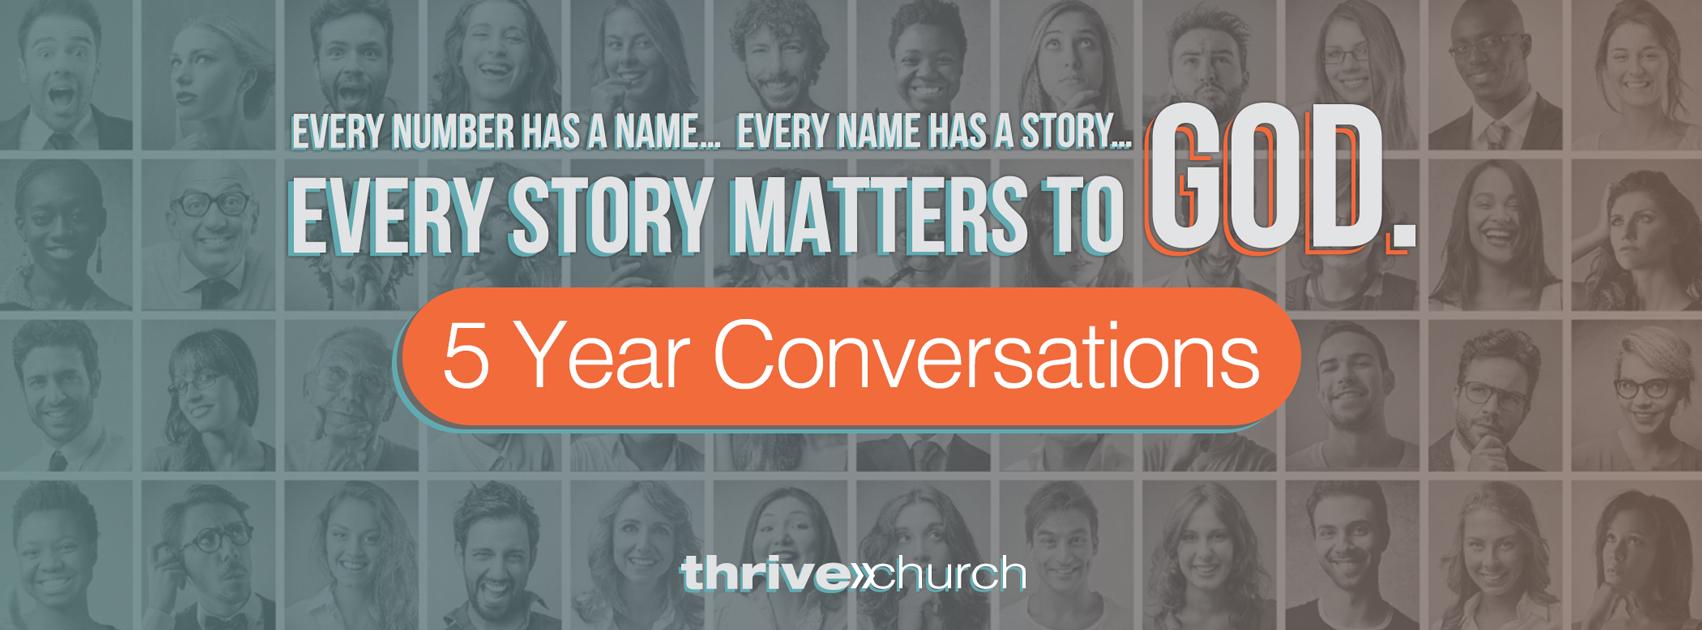 5 year conversations